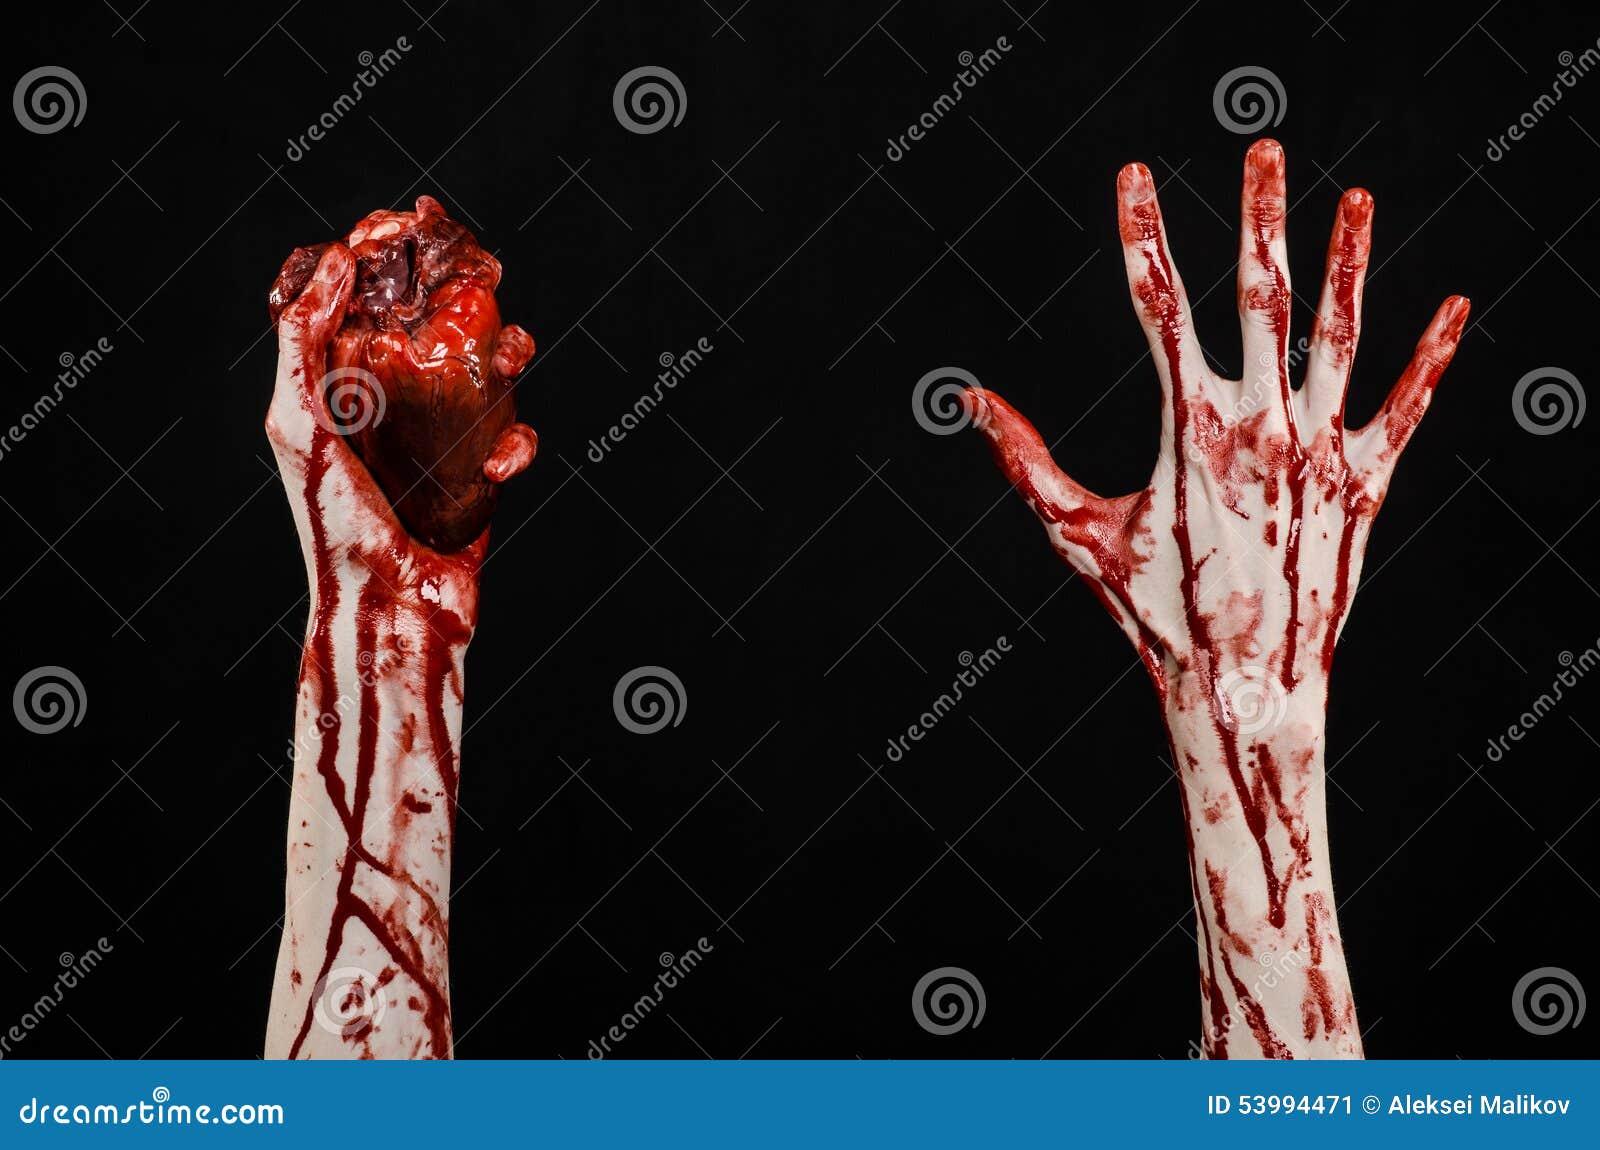 background black bleeding blood bloody halloween - Blood For Halloween